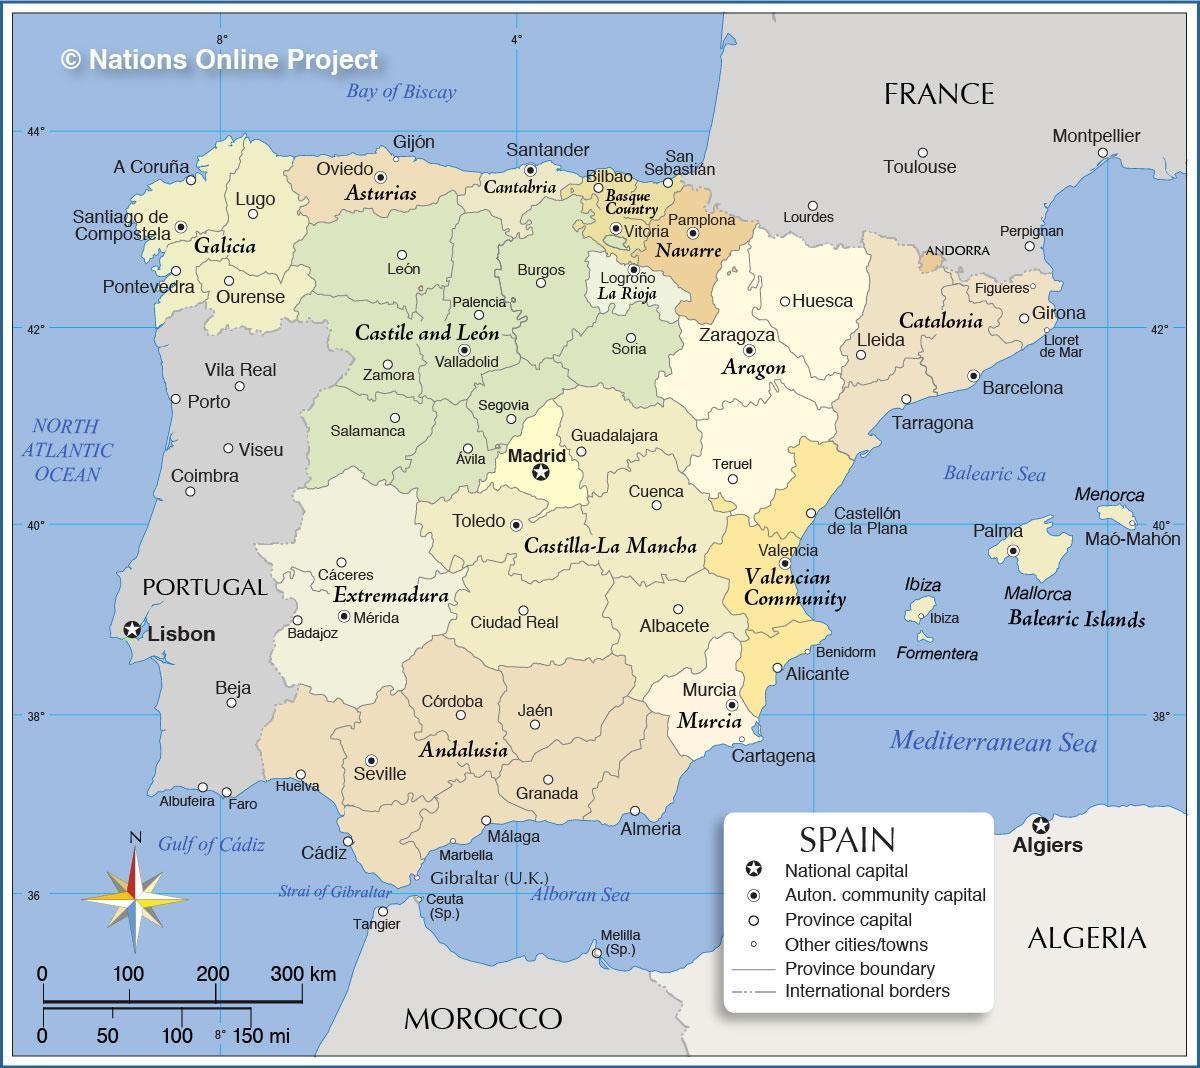 Kartta Espanja Espanja Kartta Etela Euroopassa Eurooppa